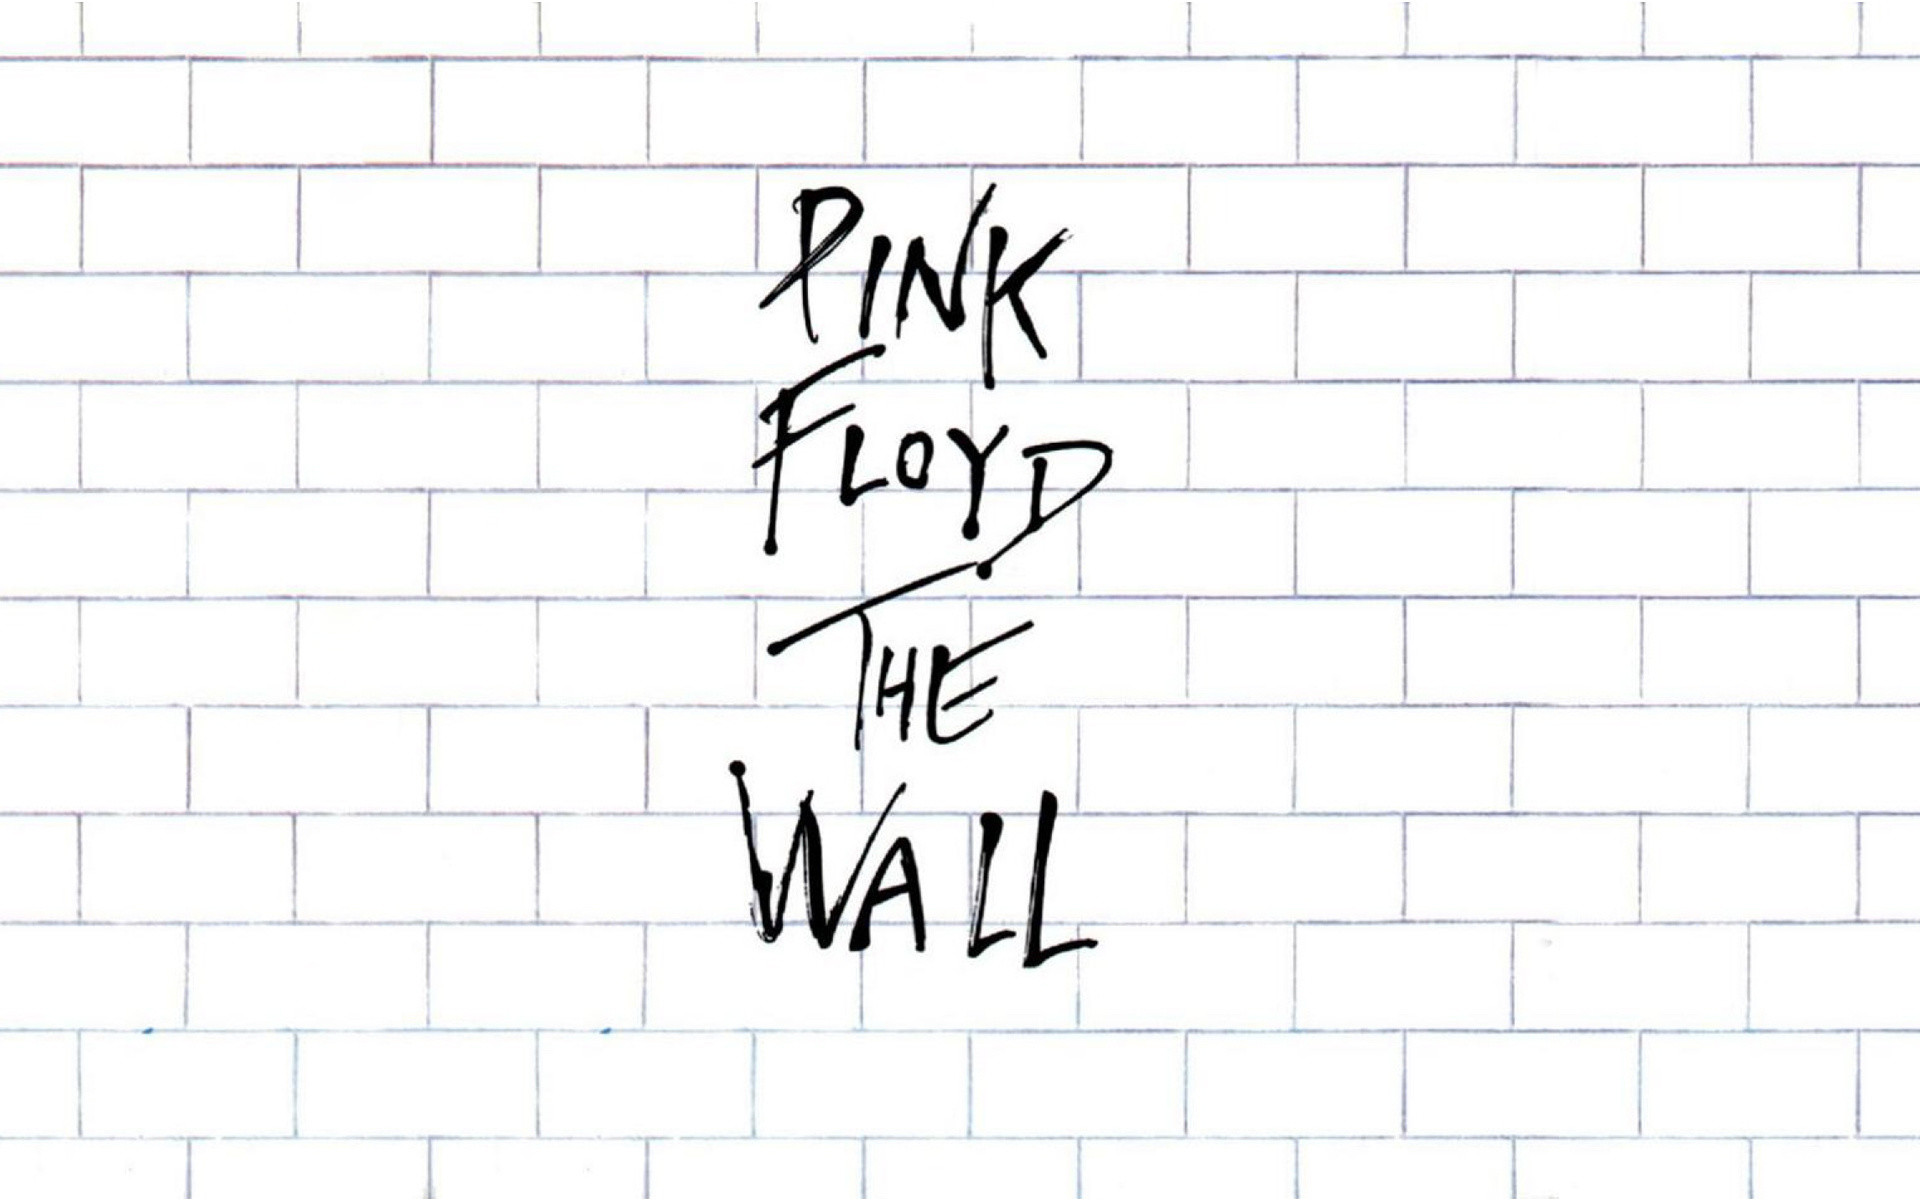 Pink Floyd Wallpaper, wallpaper, Pink Floyd Wallpaper hd wallpaper .